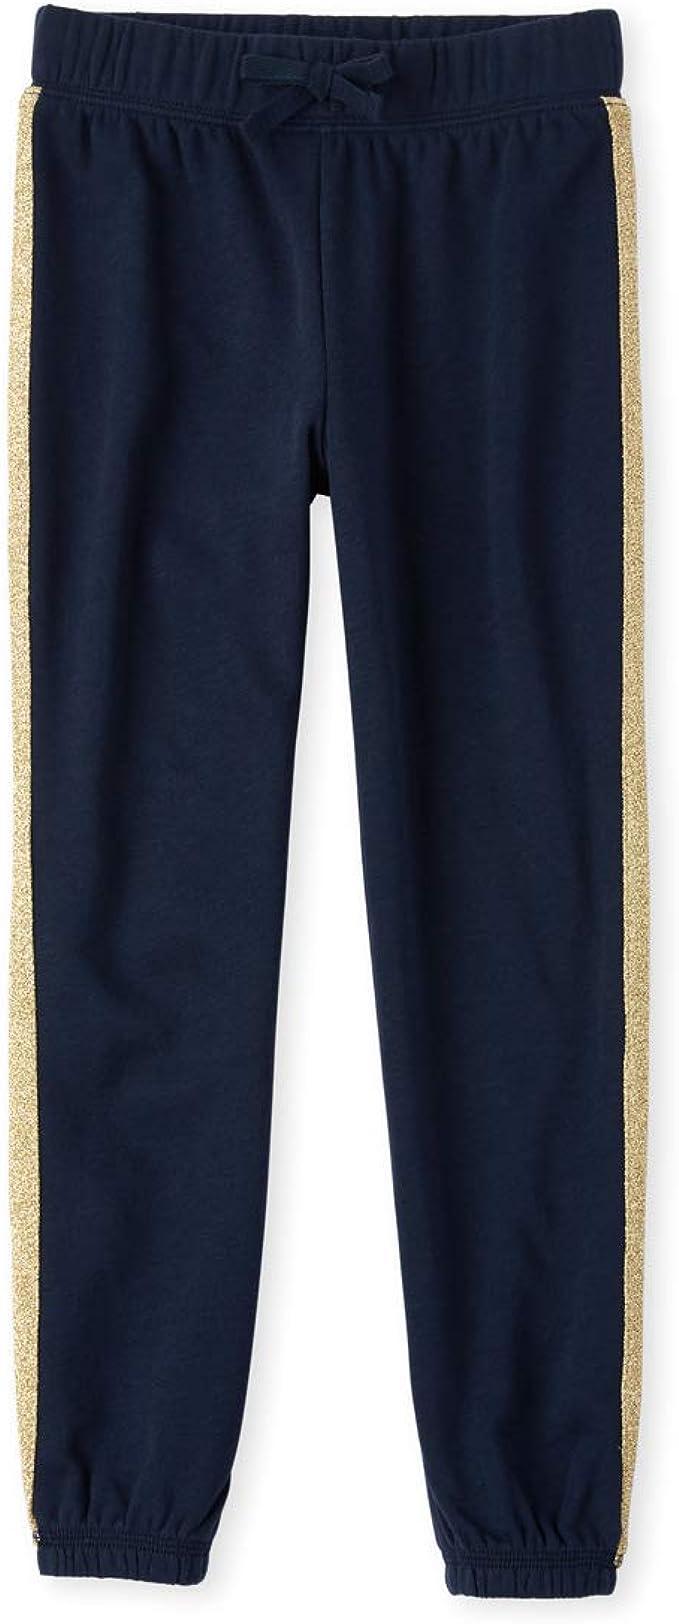 The Childrens Place Girls Skinny Solid Front Zip Pocket Jeggings Leggings